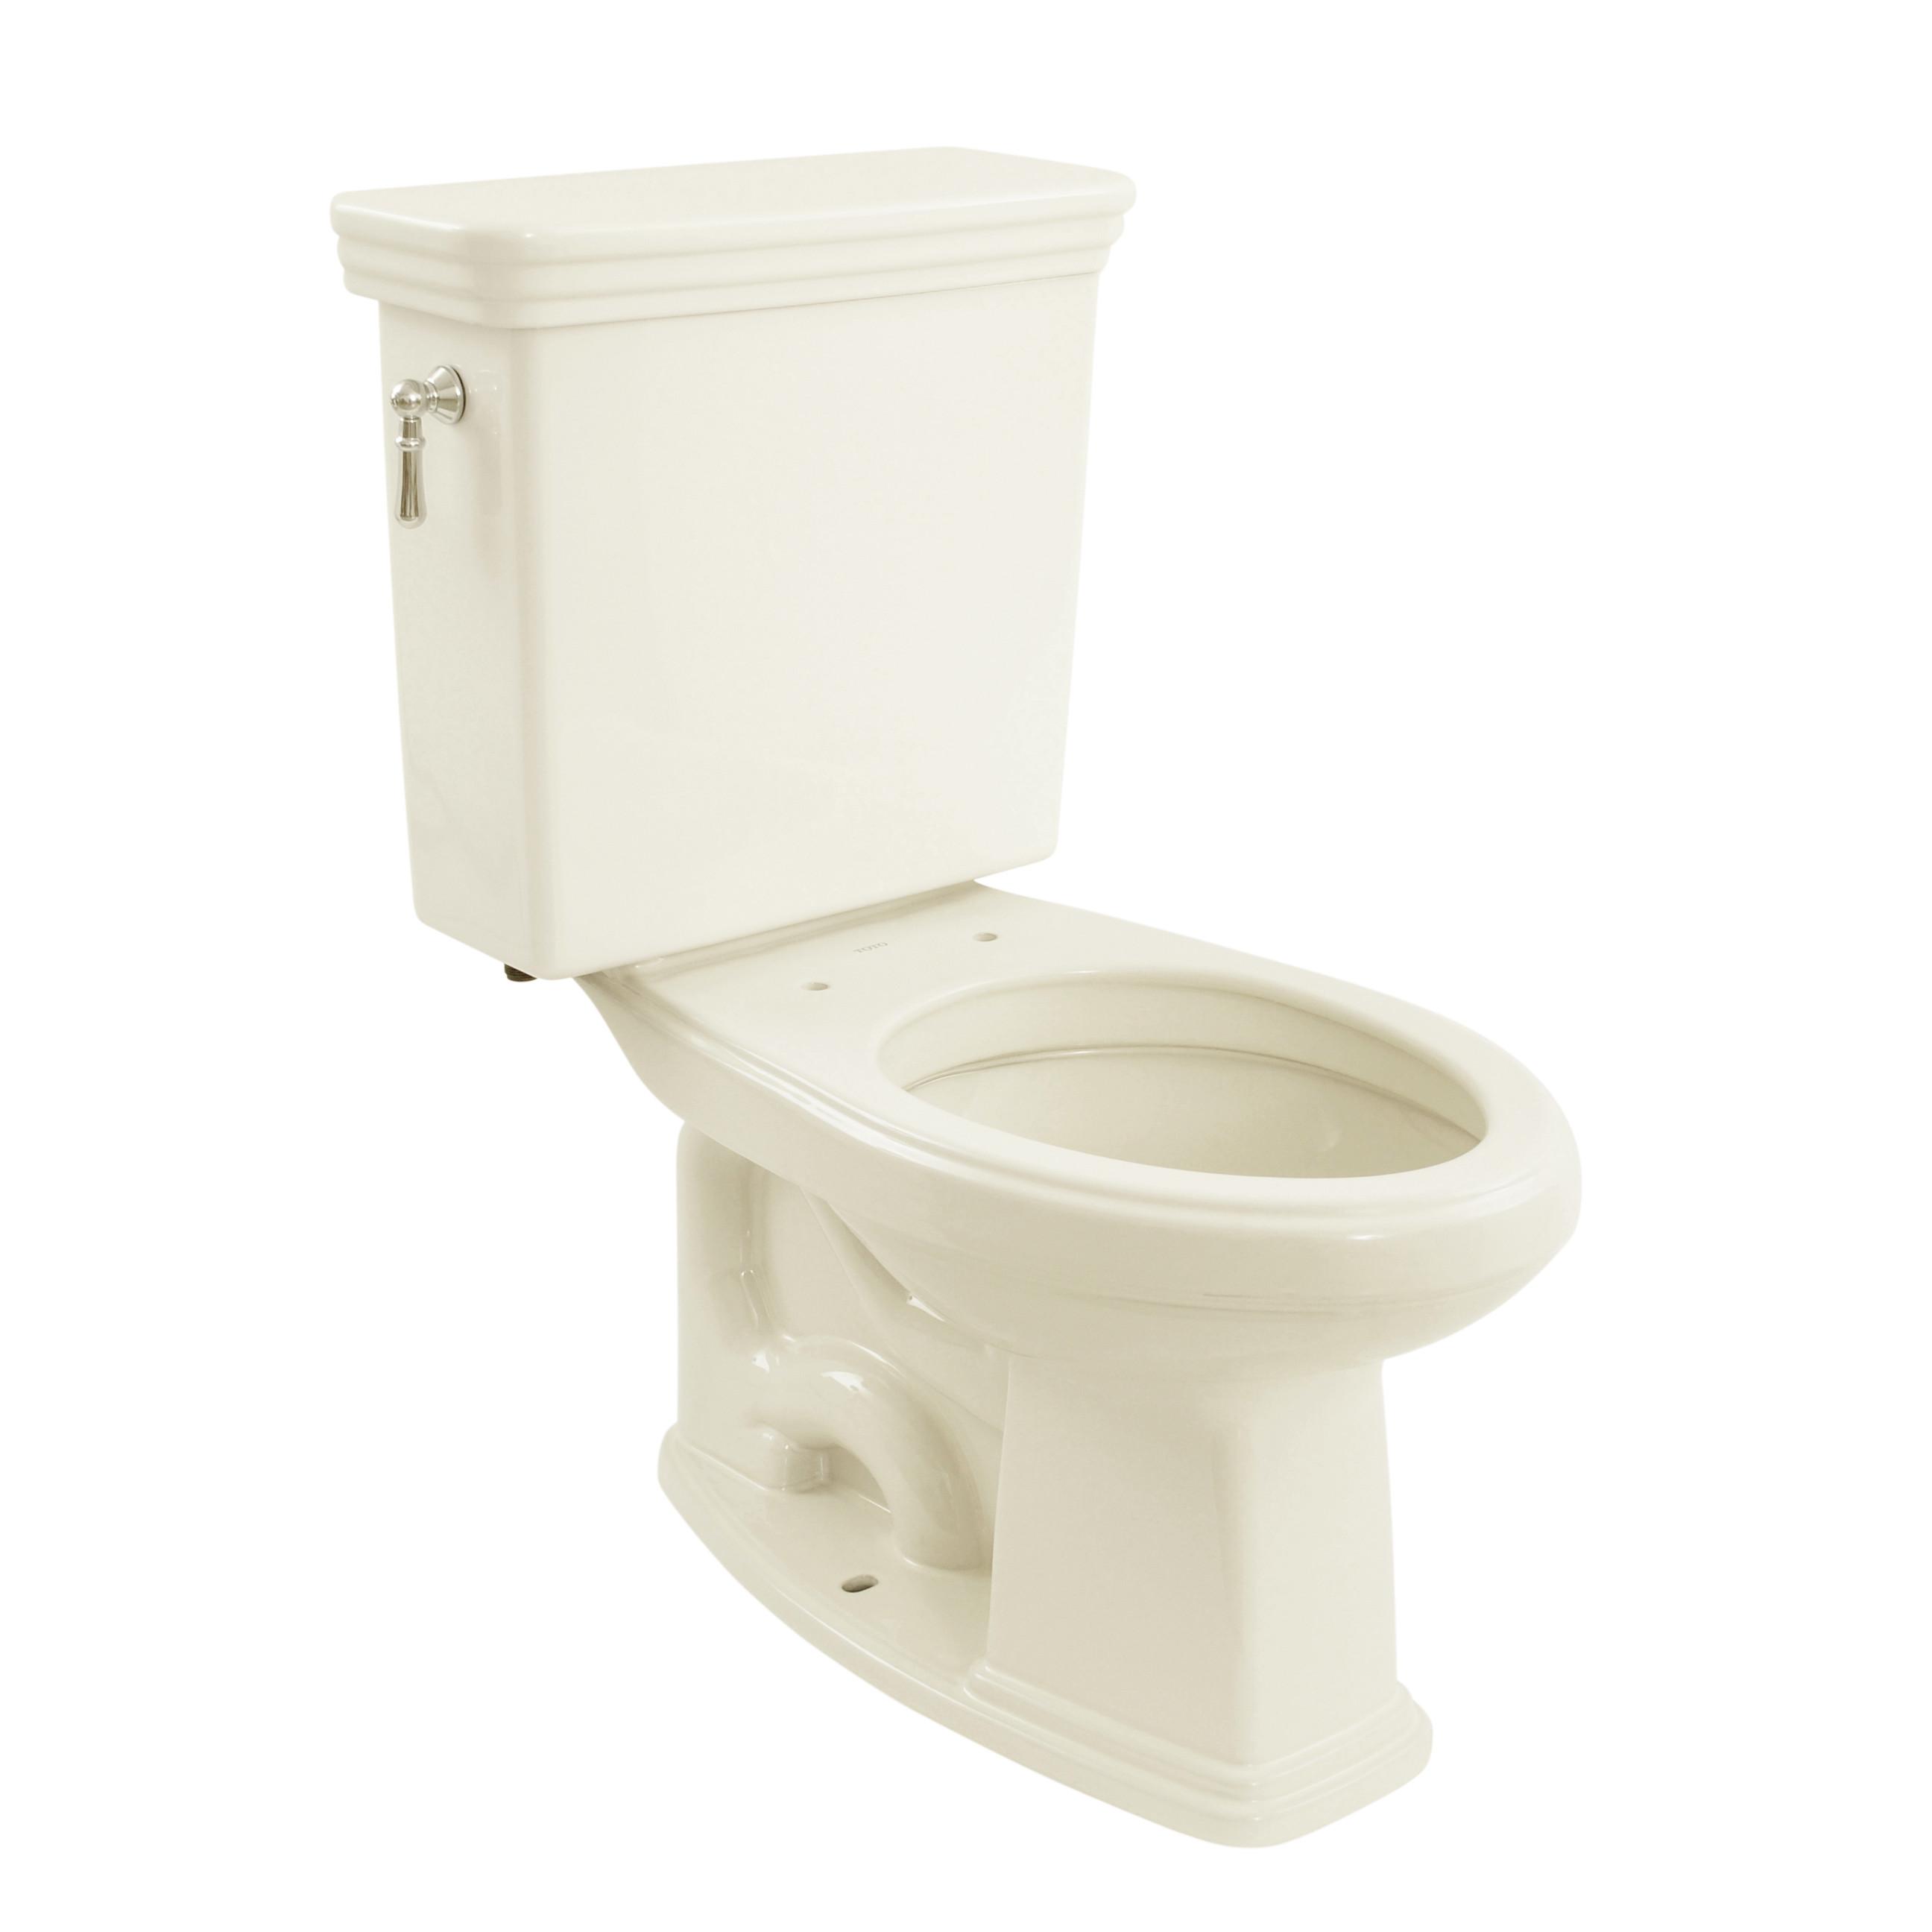 Have A Moder Toilet with Toto Toilet: Toto Toilet Home Depot | Toto 2 Piece Toilets | Toto Toilet